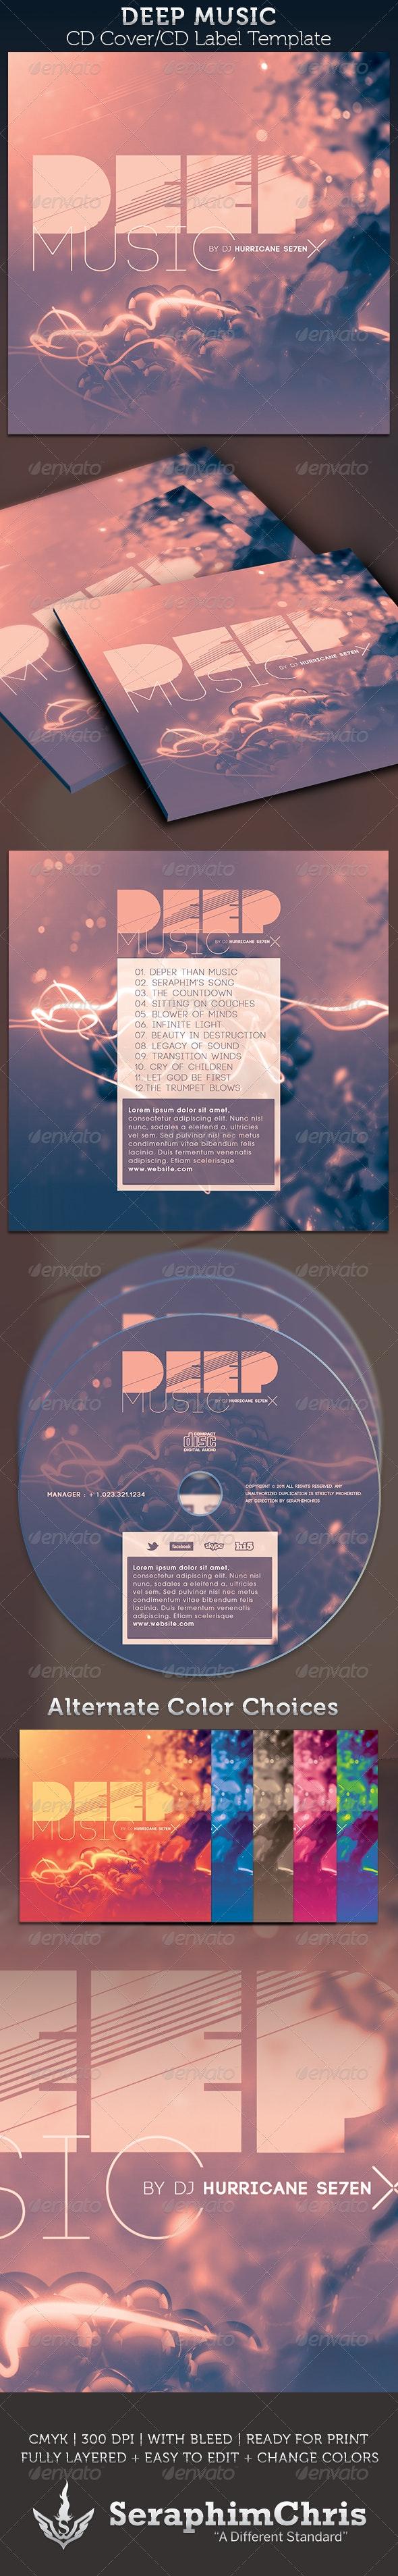 Deep Music: CD Cover Artwork Template - CD & DVD Artwork Print Templates